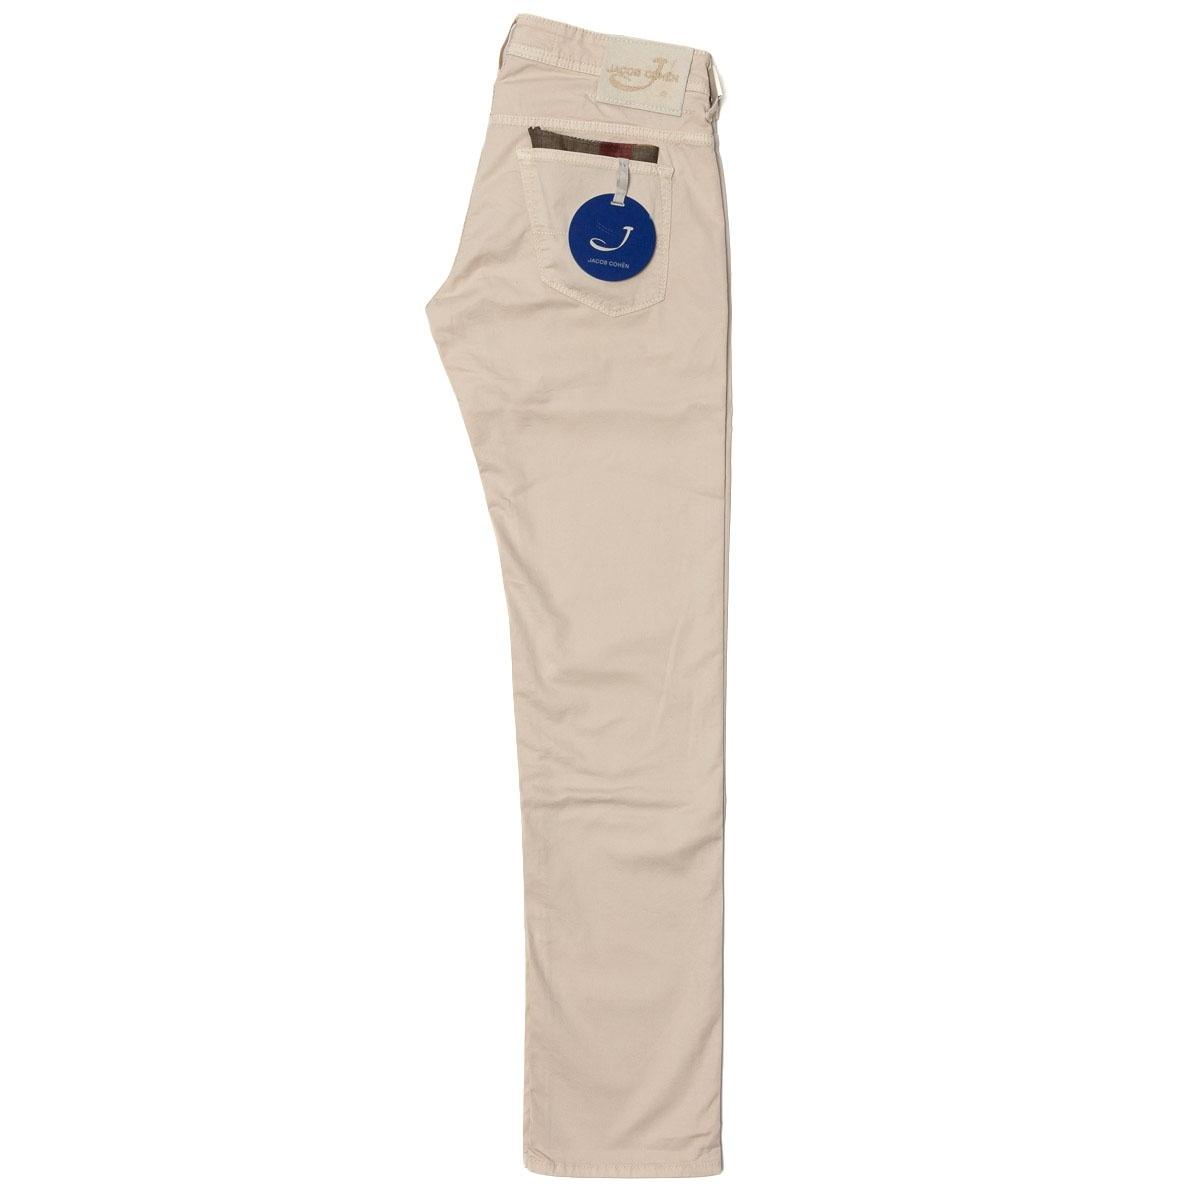 J613 Jeans-2